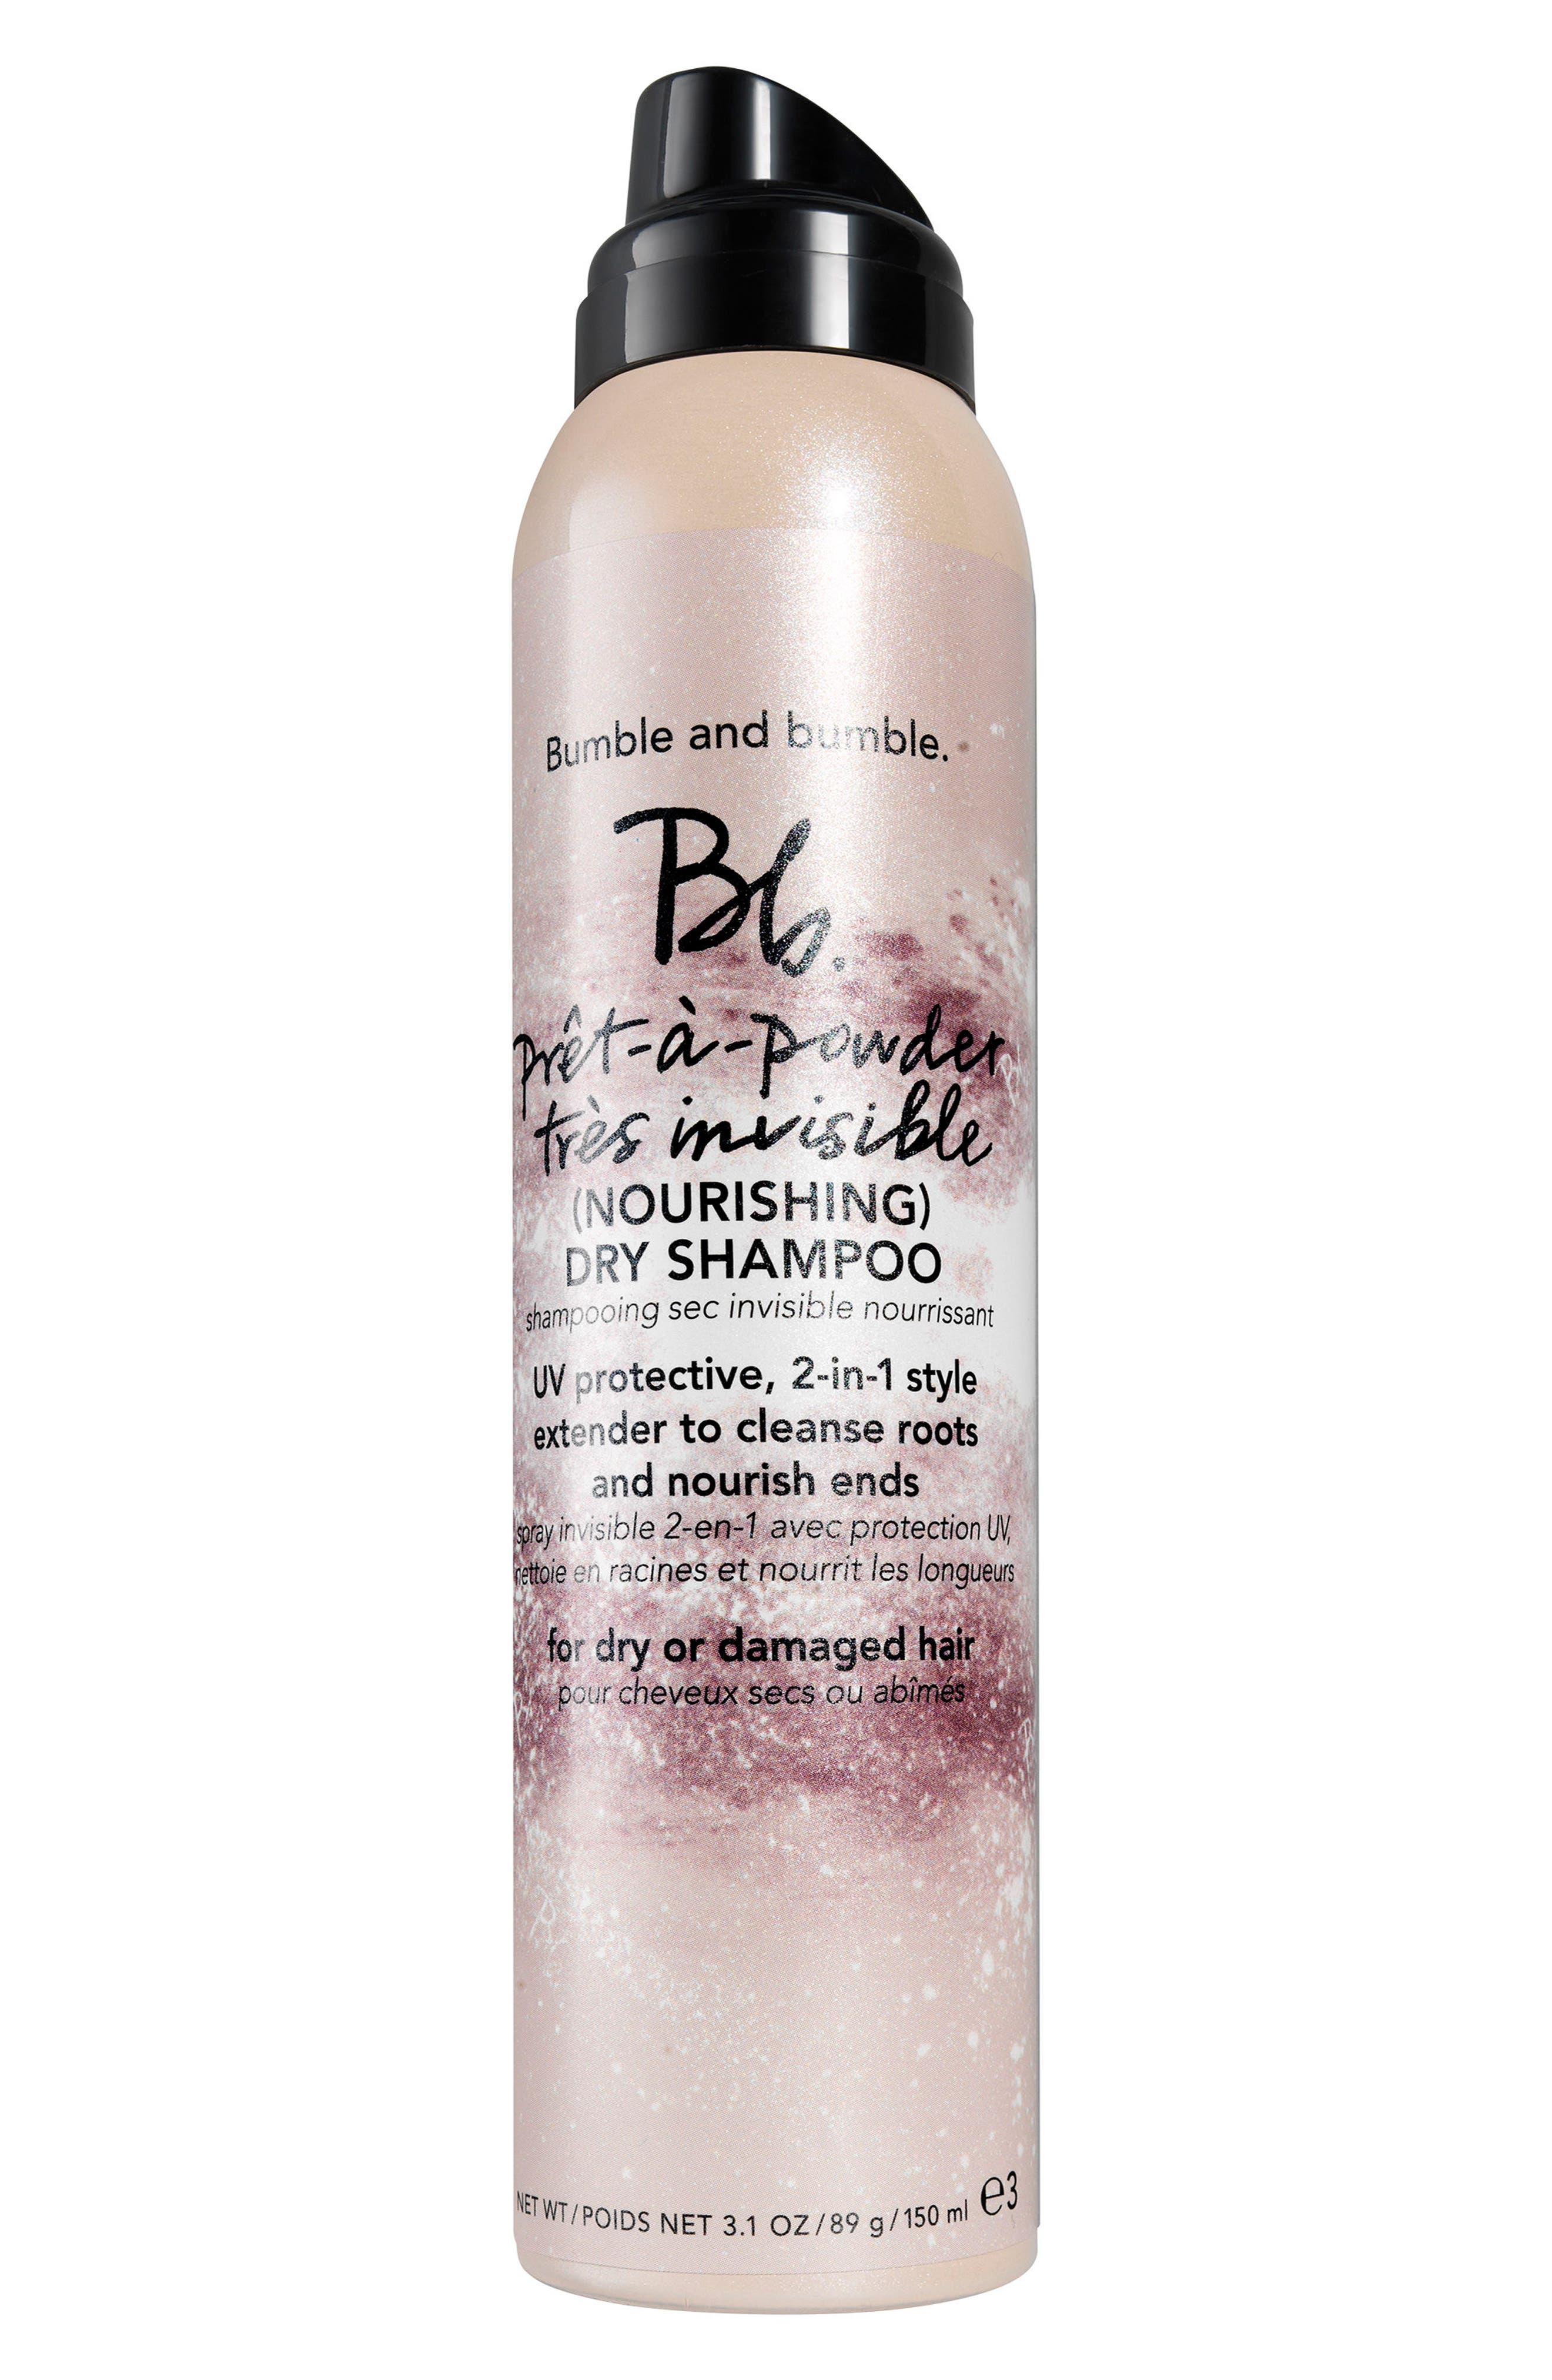 Prêt-a-Powder Très Invisible Nourishing Dry Shampoo,                             Main thumbnail 1, color,                             NO COLOR